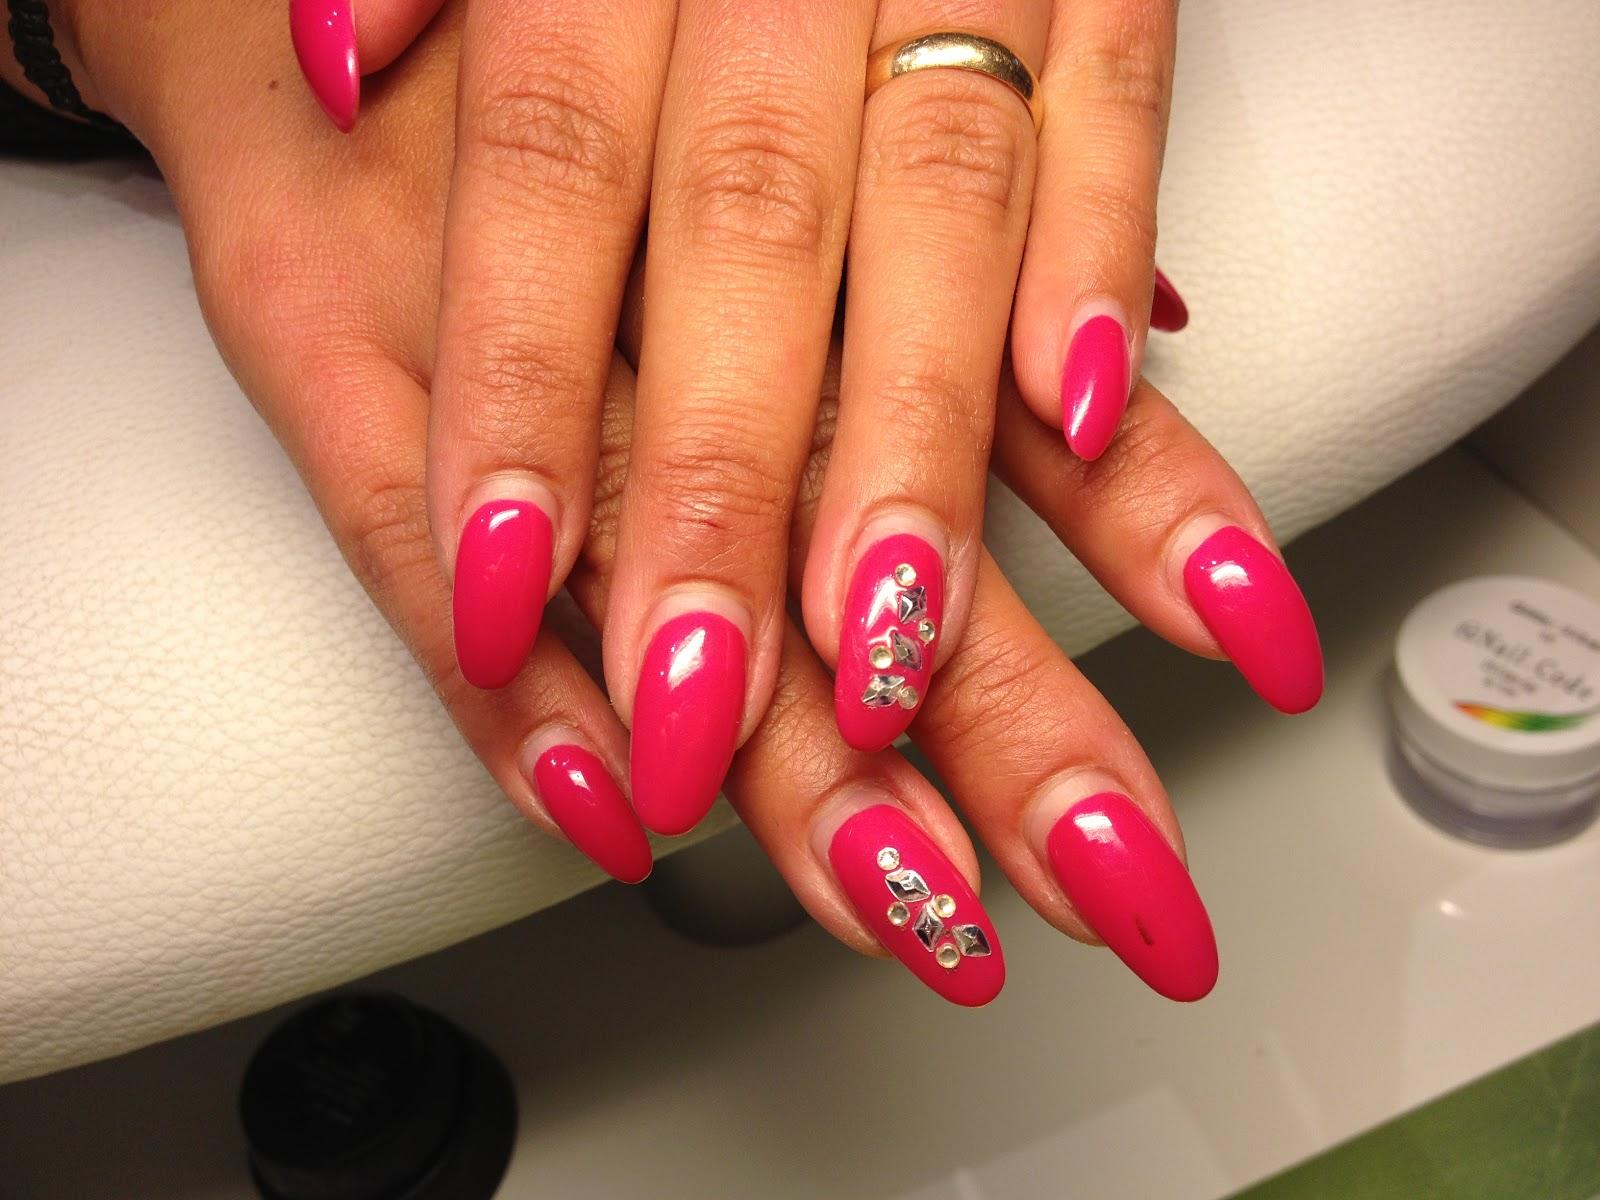 charlotte perrelli naglar